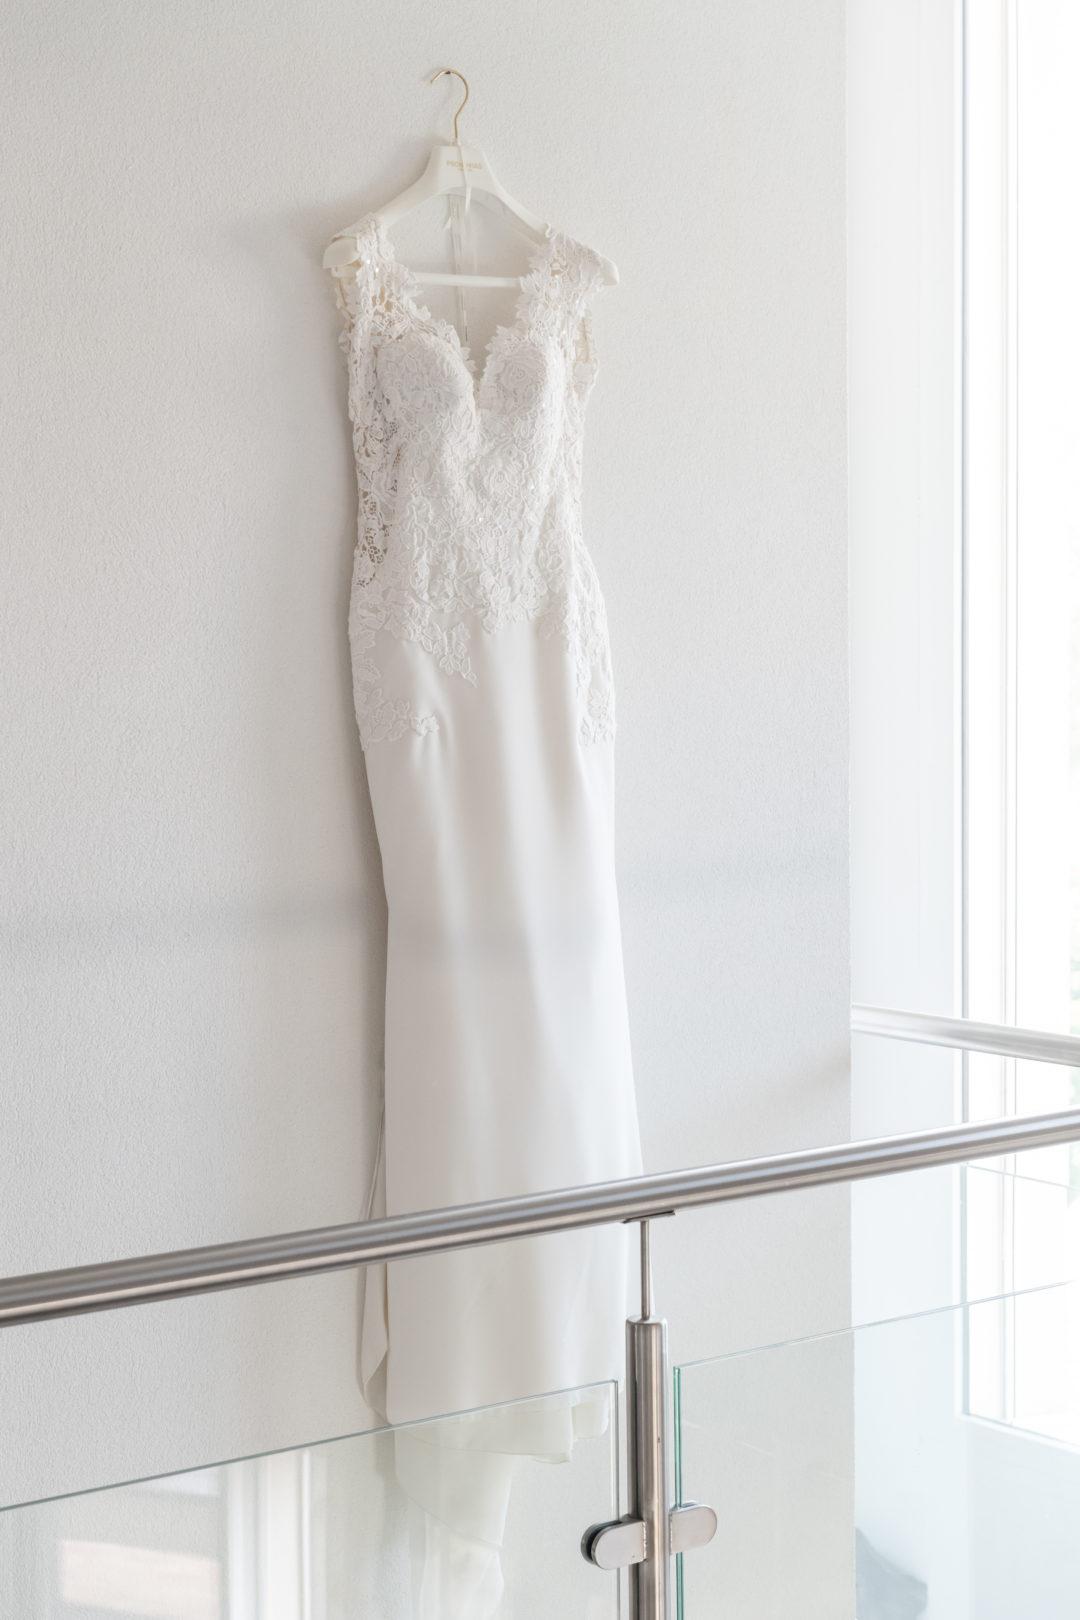 Robe de la mariée. Géraldine wedding planner. Wedding planner suisse